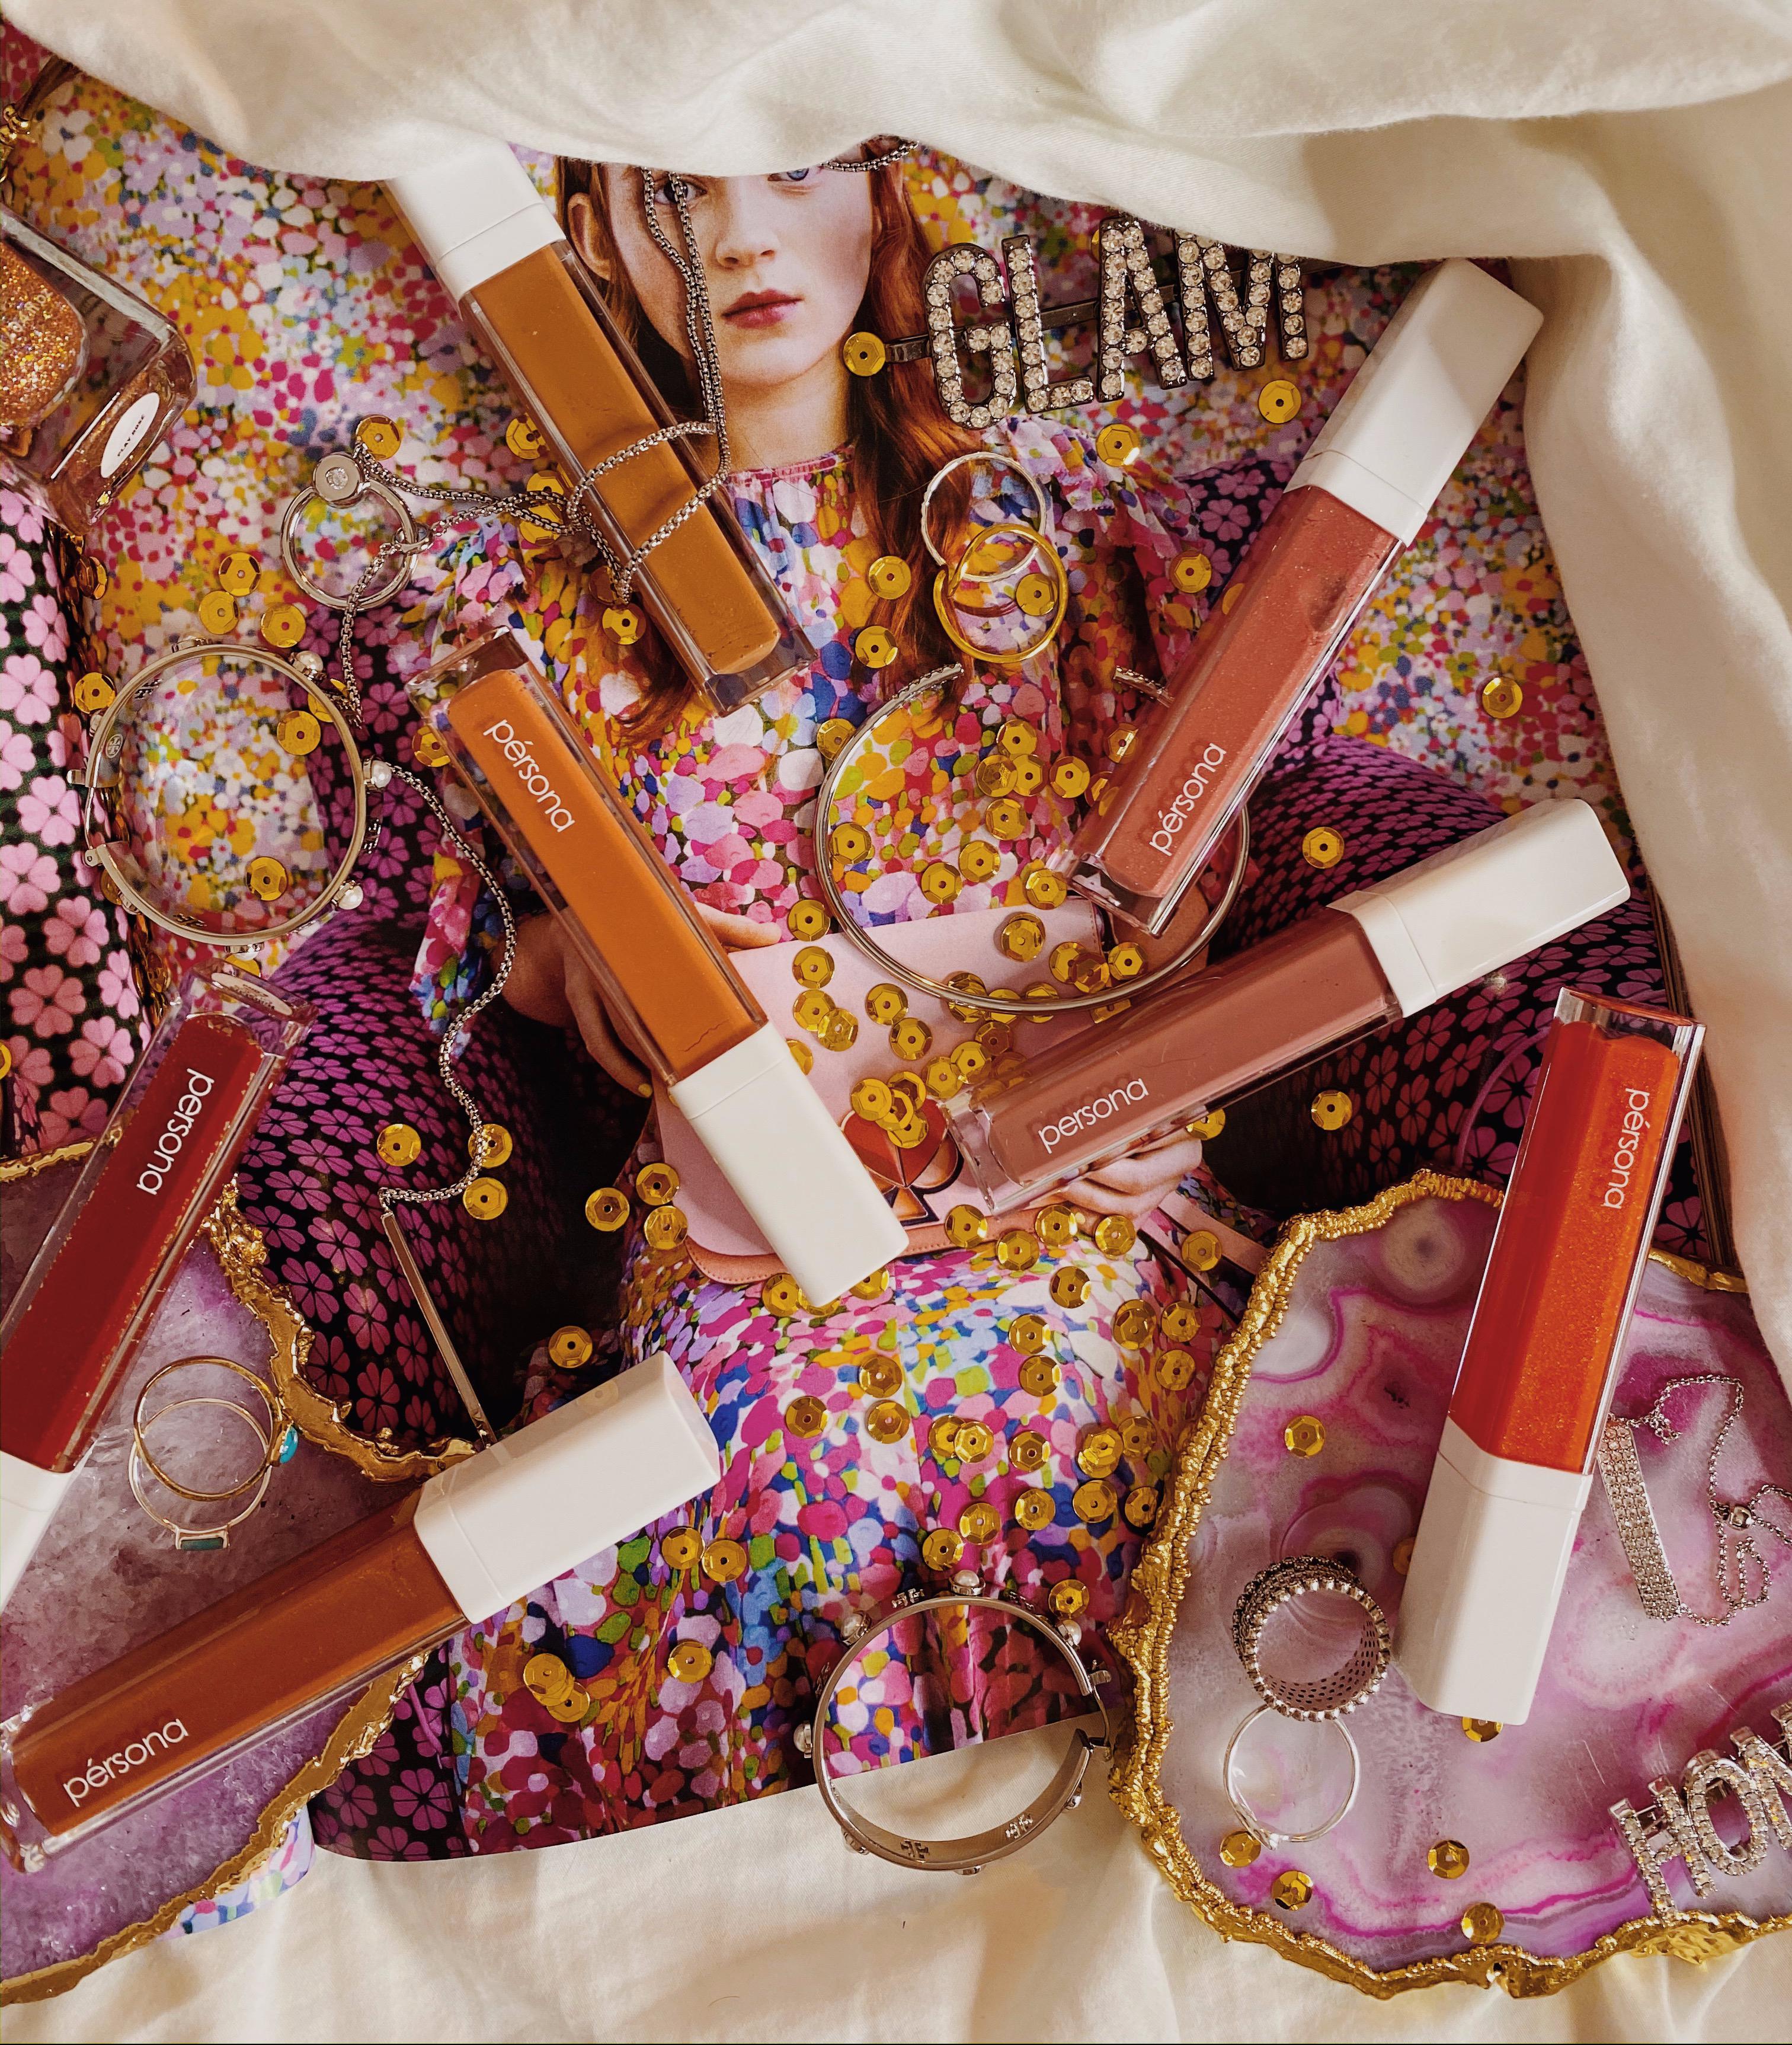 Lip Gloss Collection Ranking | Persona Cosmetics Season One Lip Gloss | Honey | Toffee | Peach | Pink | Coral | Shortcake | Hibiscus